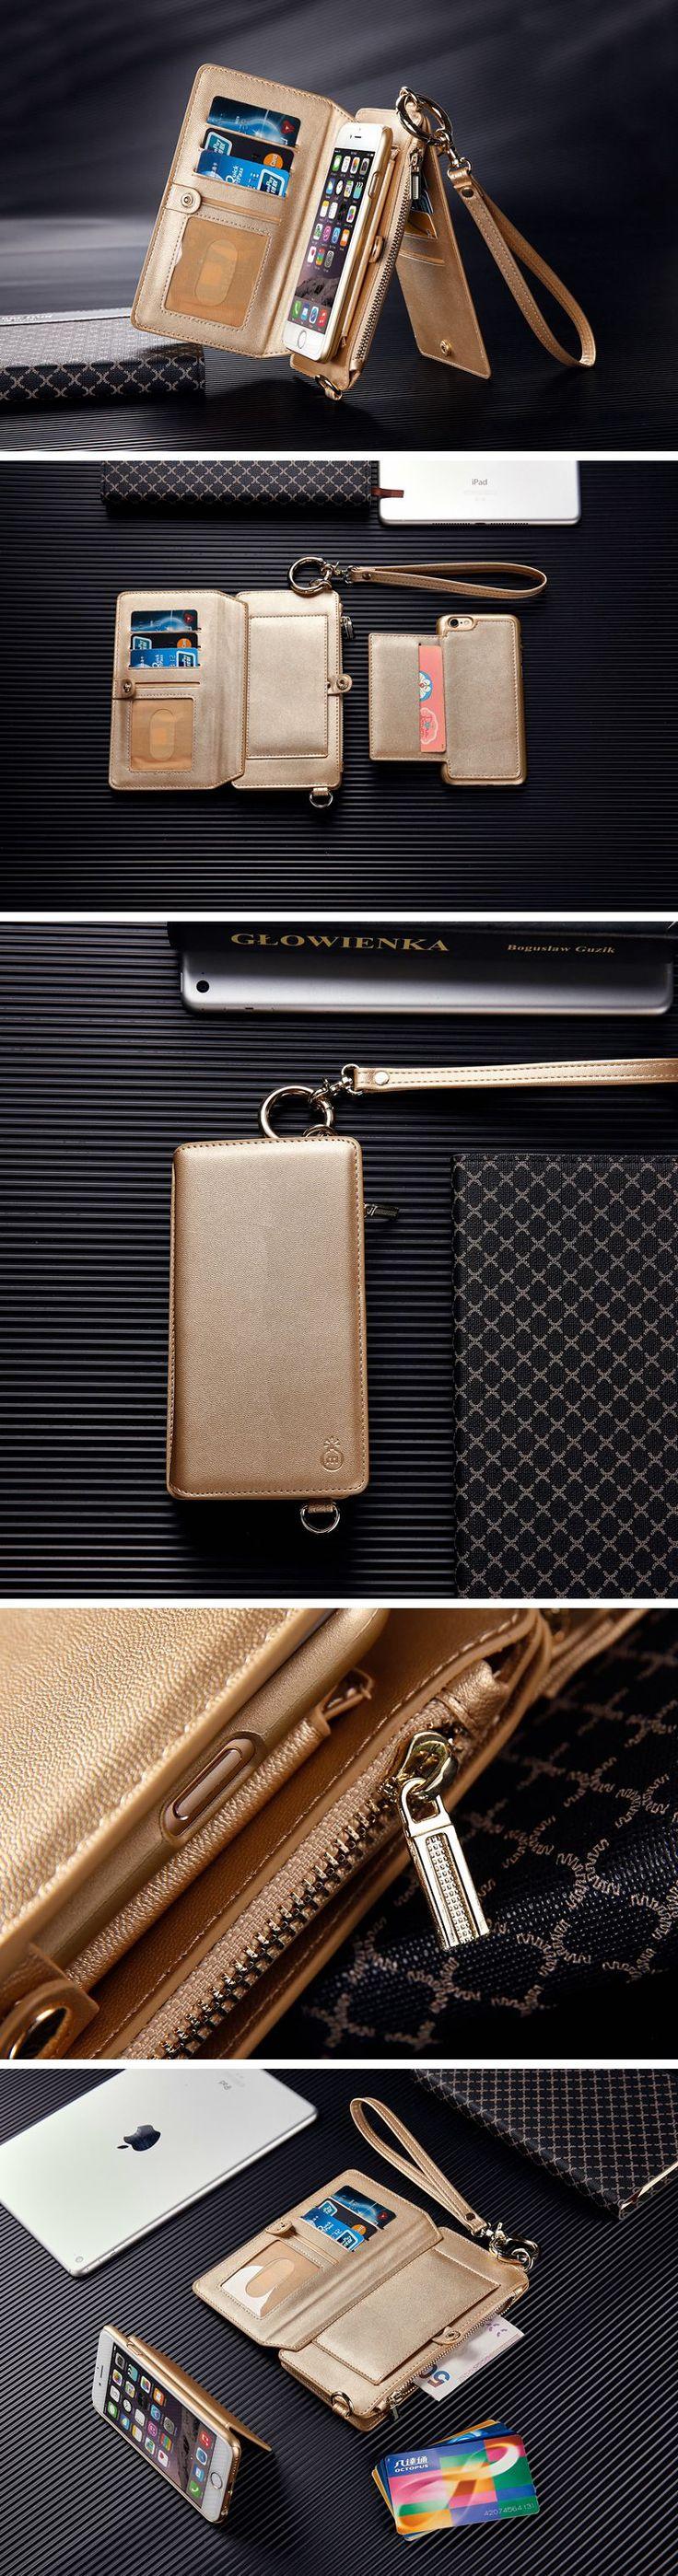 Removable Leather Wallet Holder Filp Card Case Shoulder Bag Women Purse For iPhone 6 Plus 6S Plus Sale - Banggood.com